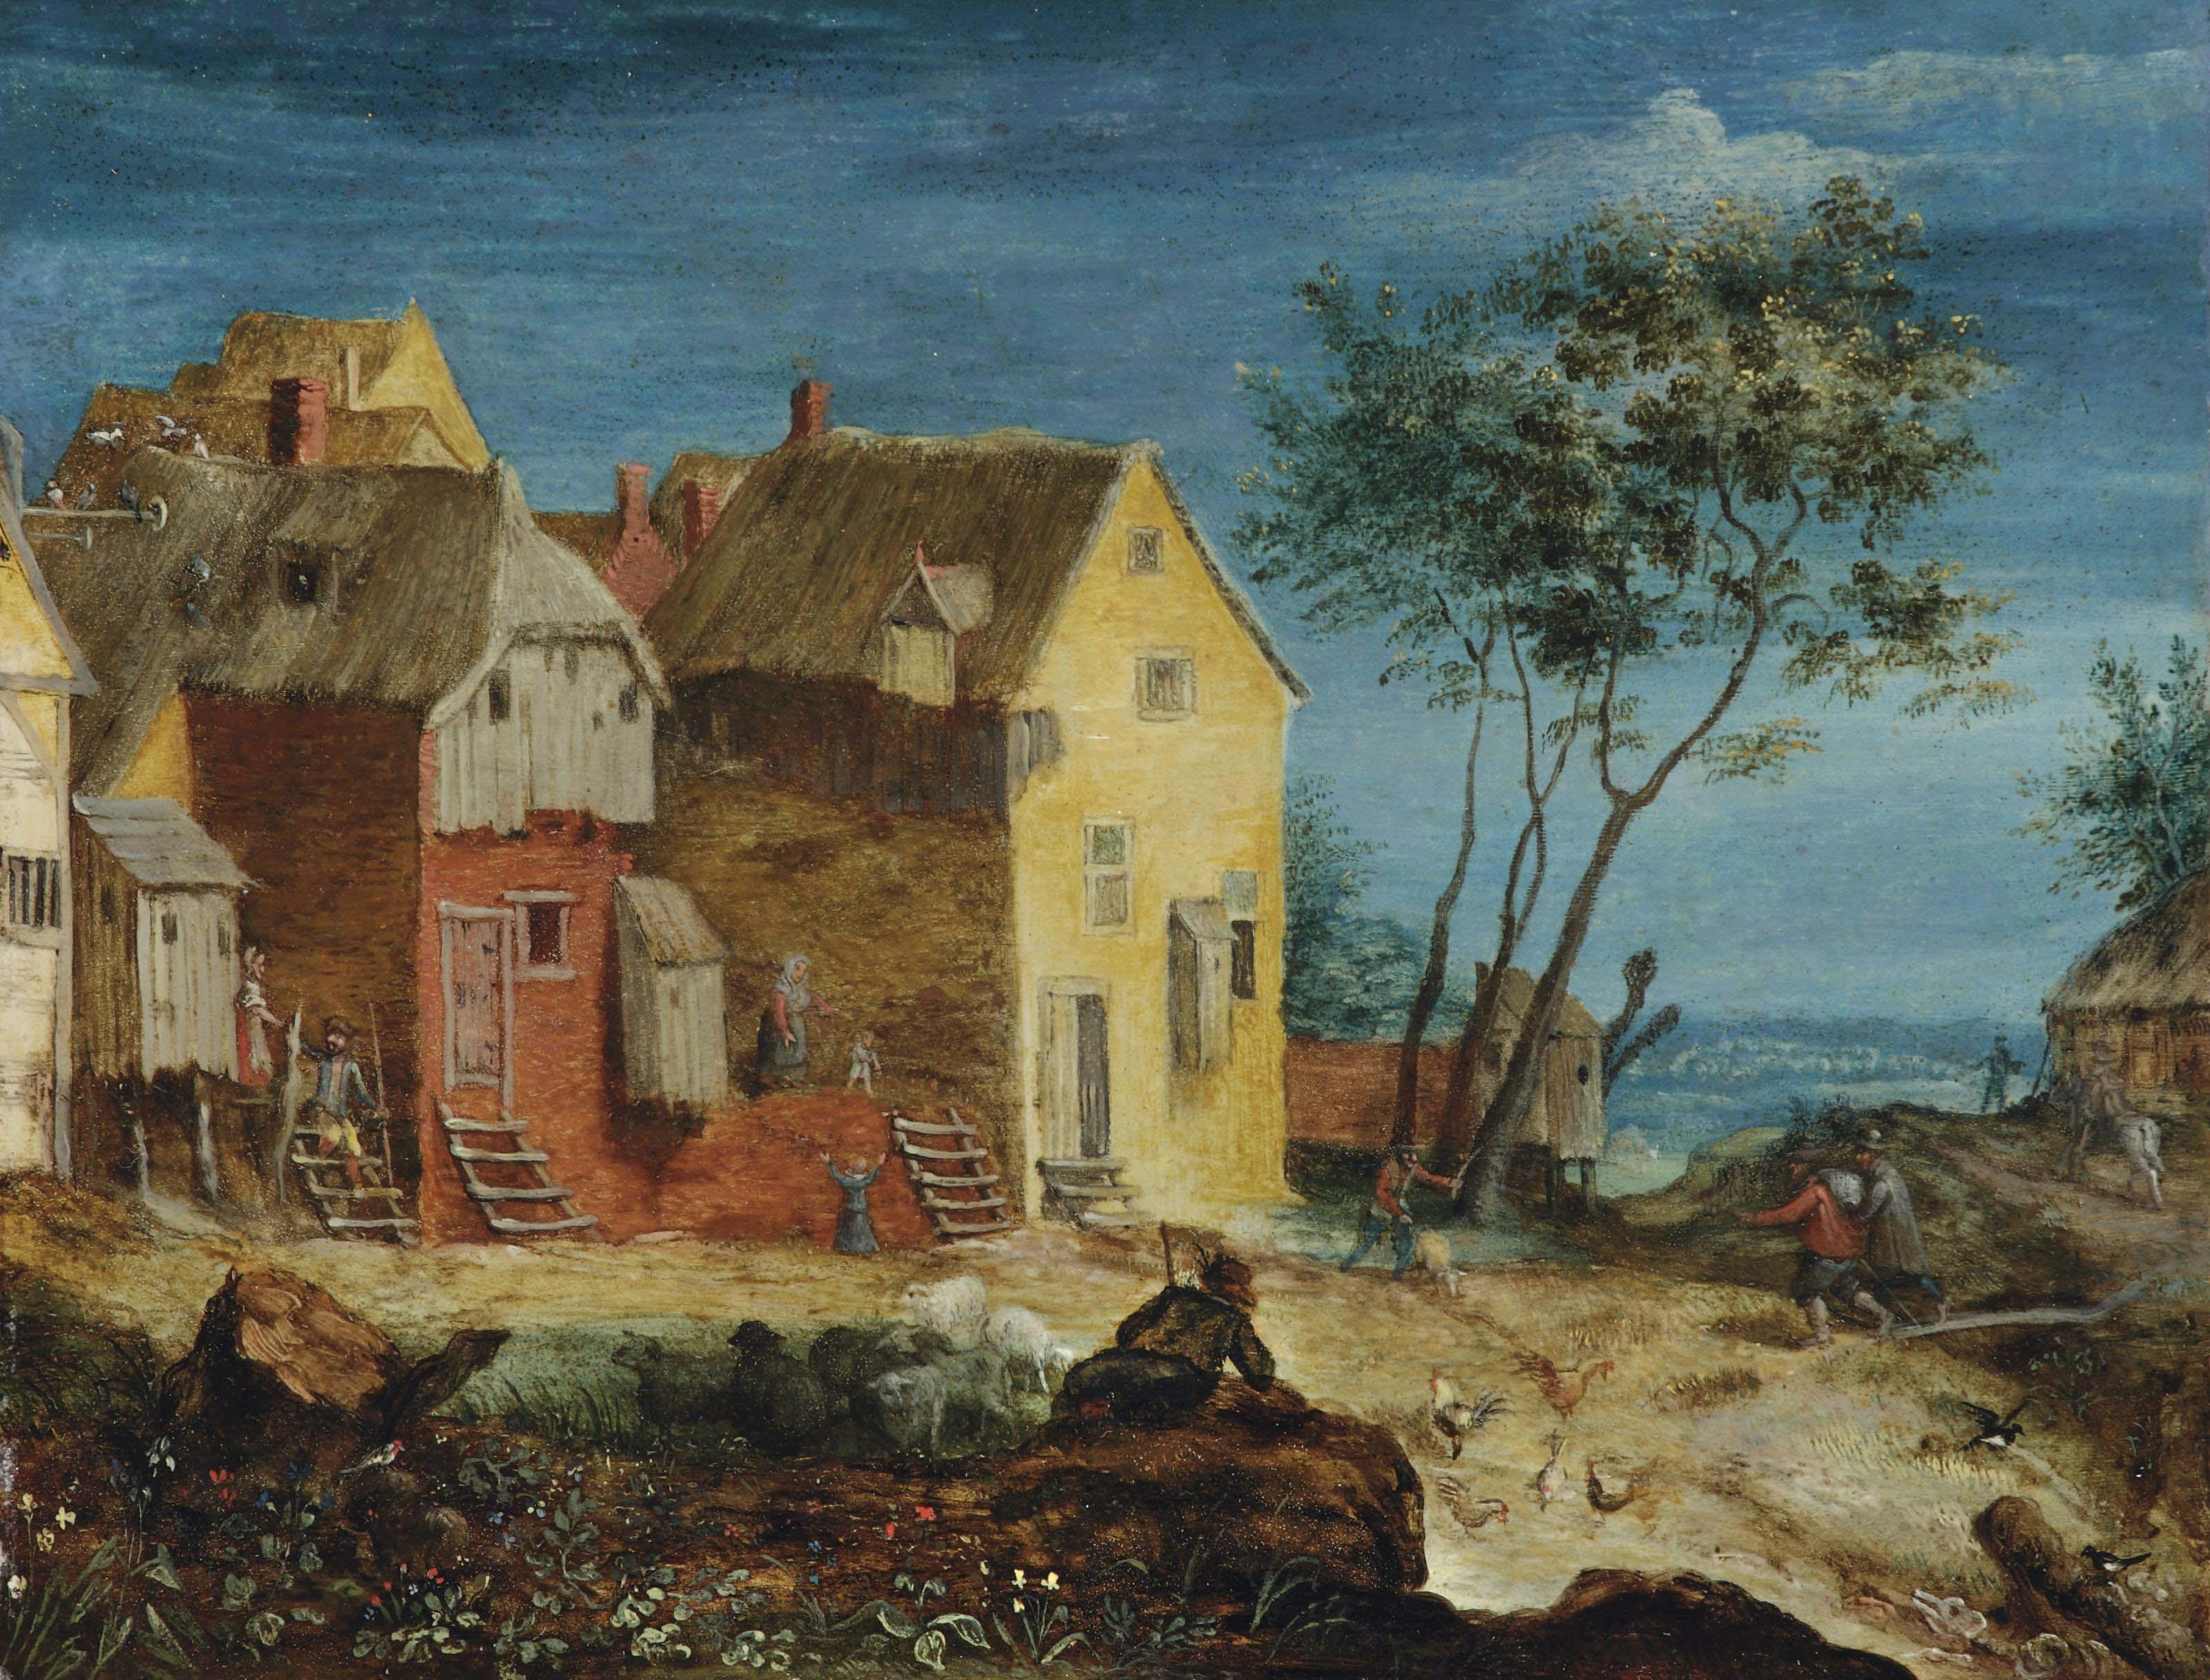 Figures in a village, a landscape beyond